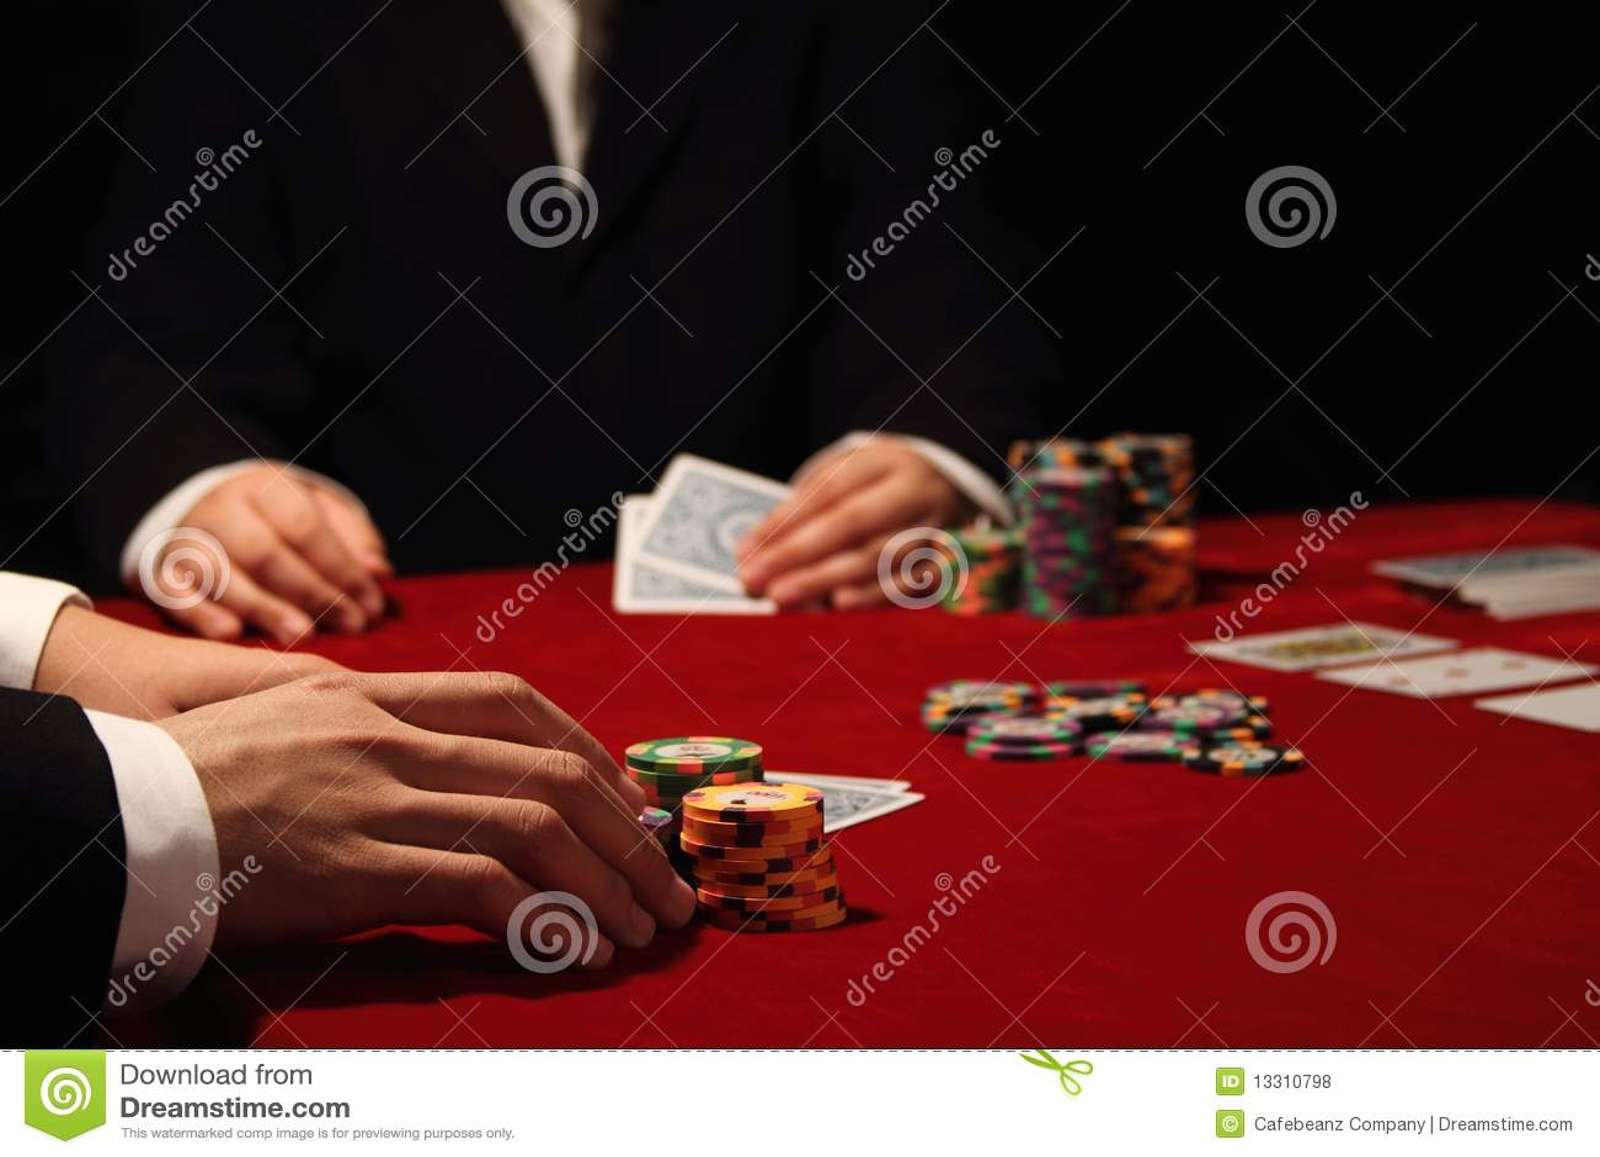 Poker Game Of for kids